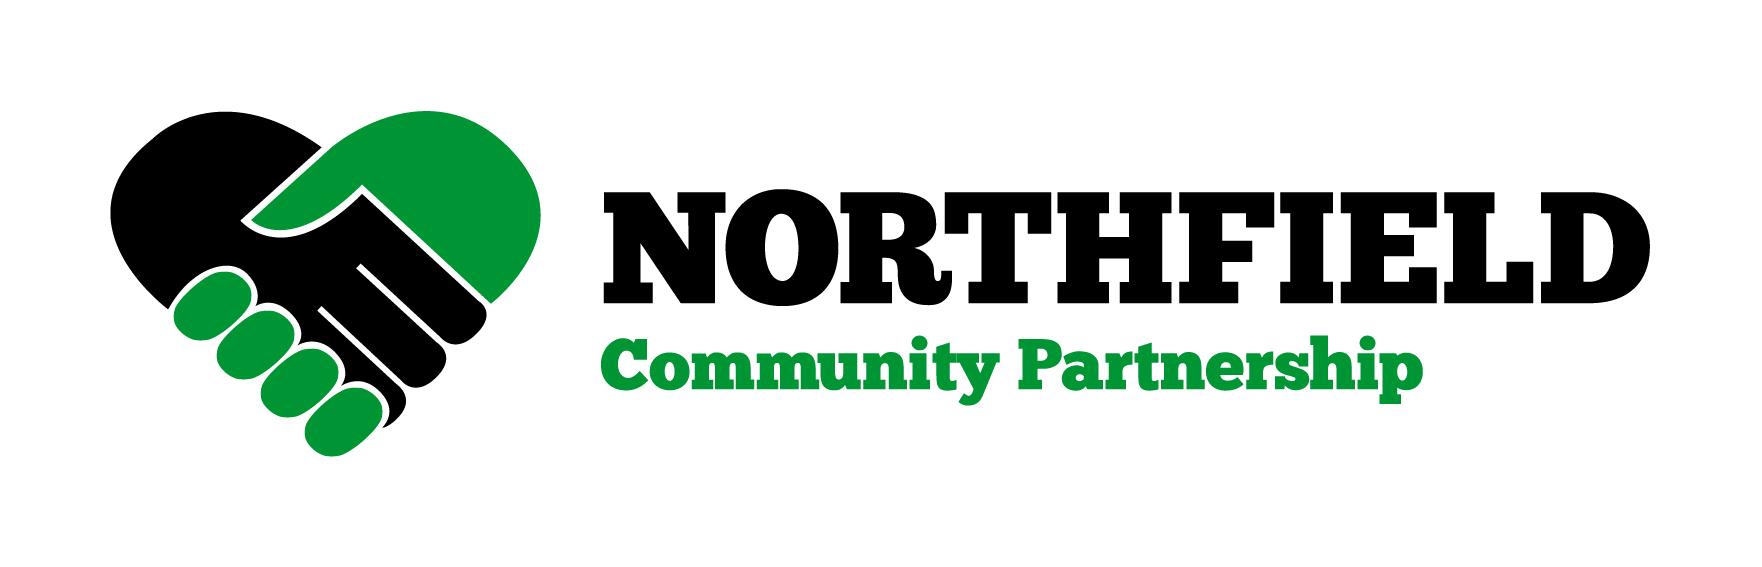 Northfield Community Partnership